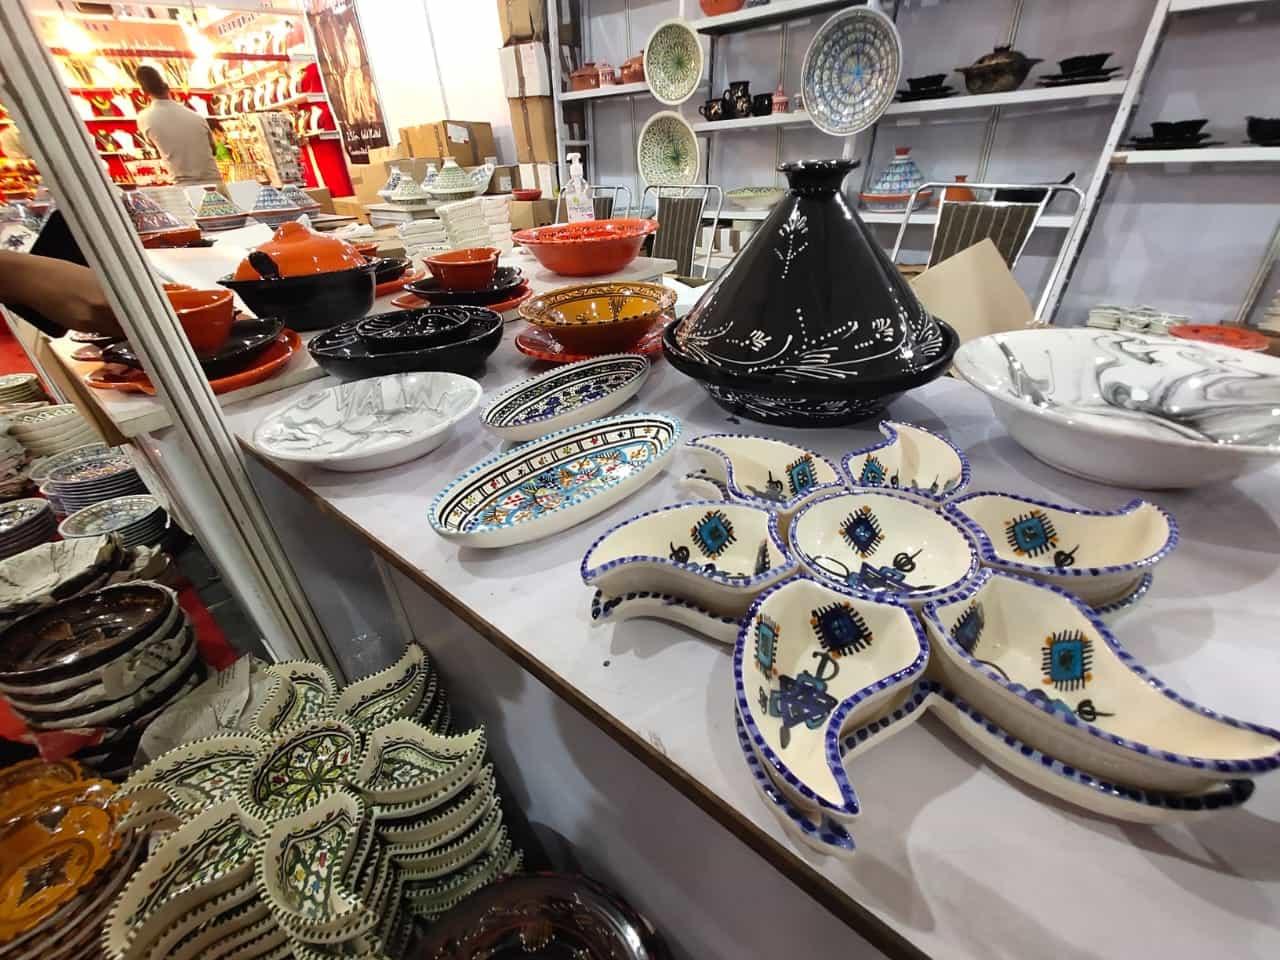 India International Mega Trade Fair and Home & Decor Bhubaneswar 2021